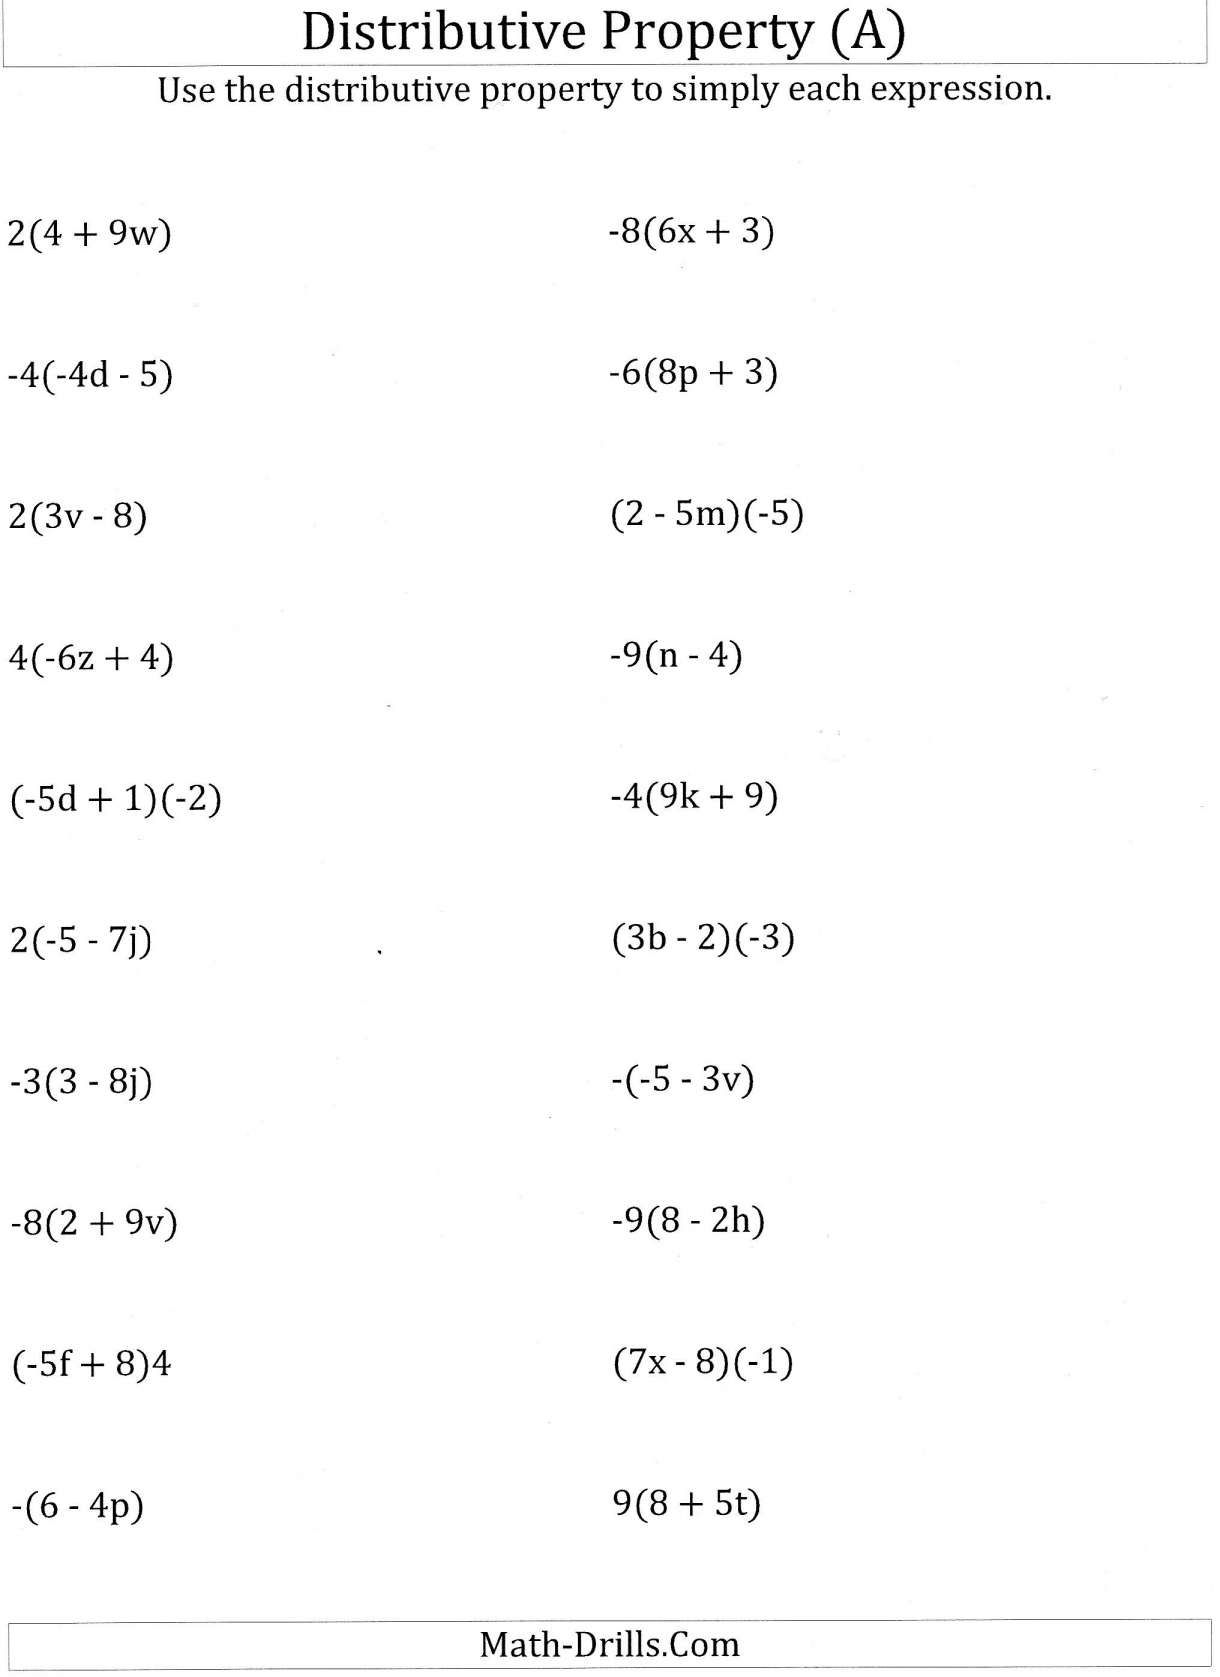 11 7th Grade Distributive Property Worksheet